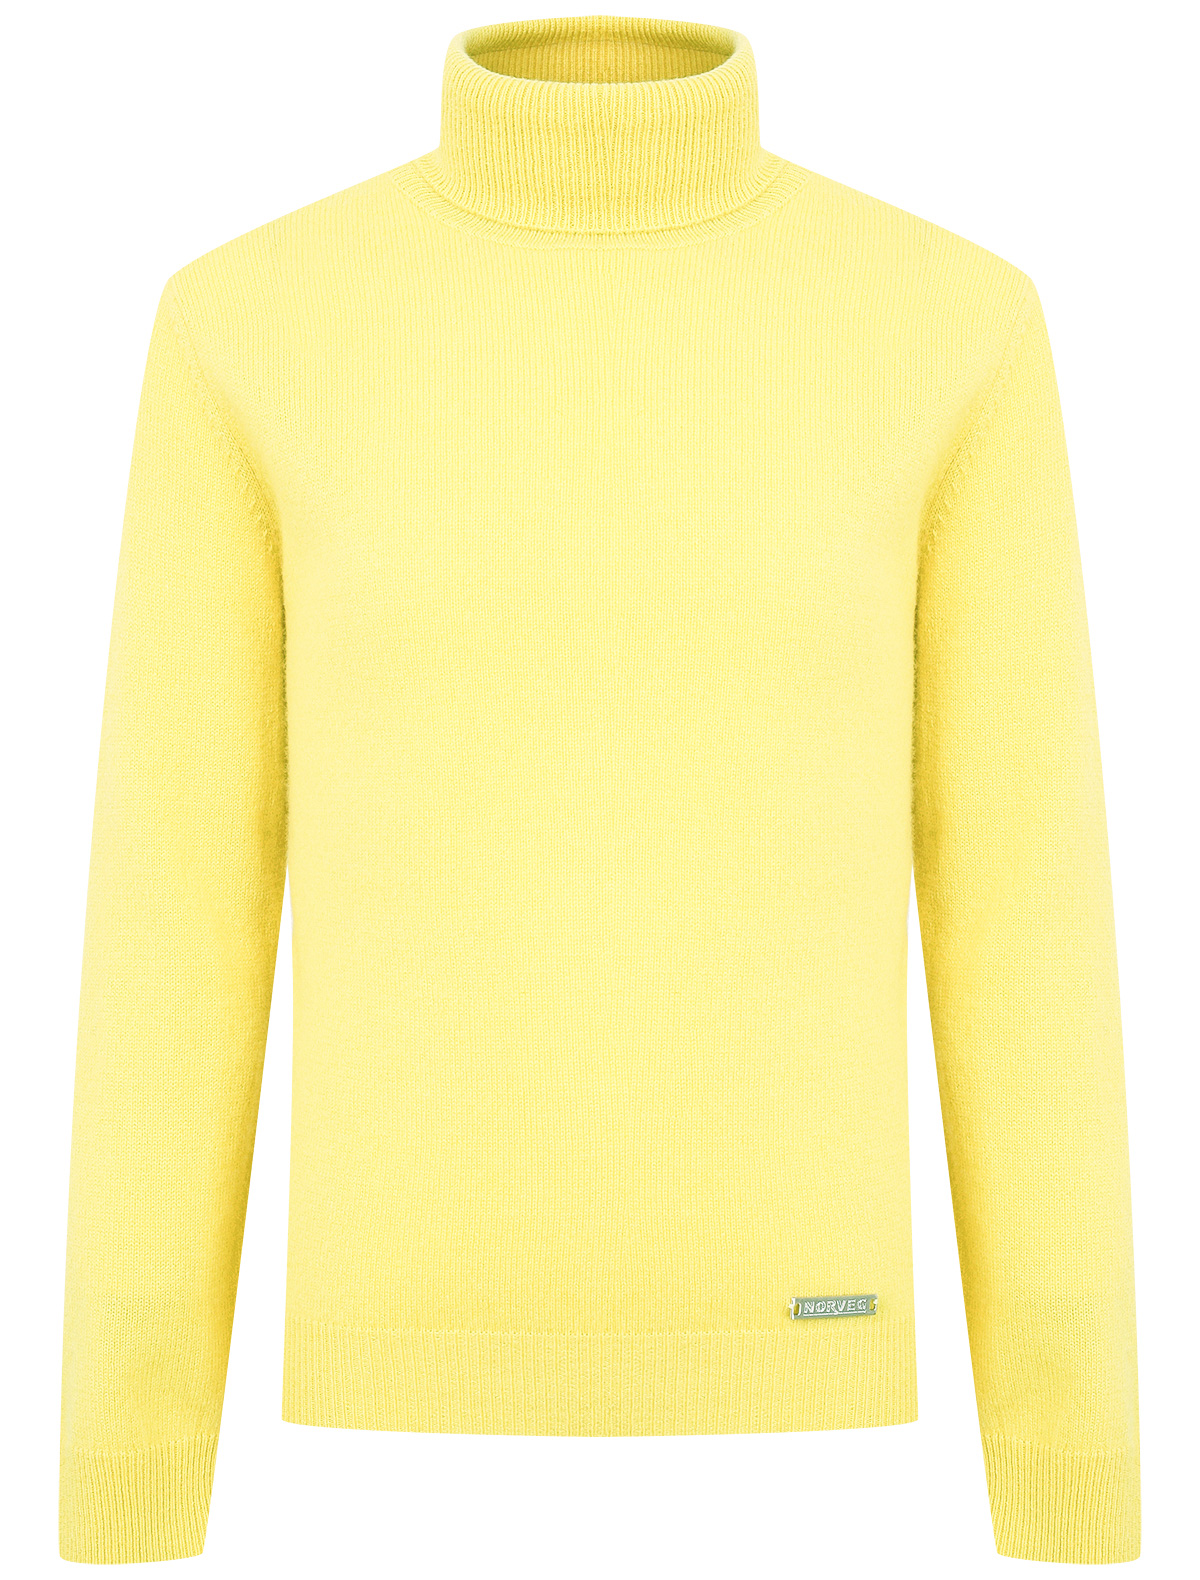 Купить 2122754, Джемпер NORVEG, желтый, Женский, 1262809980023